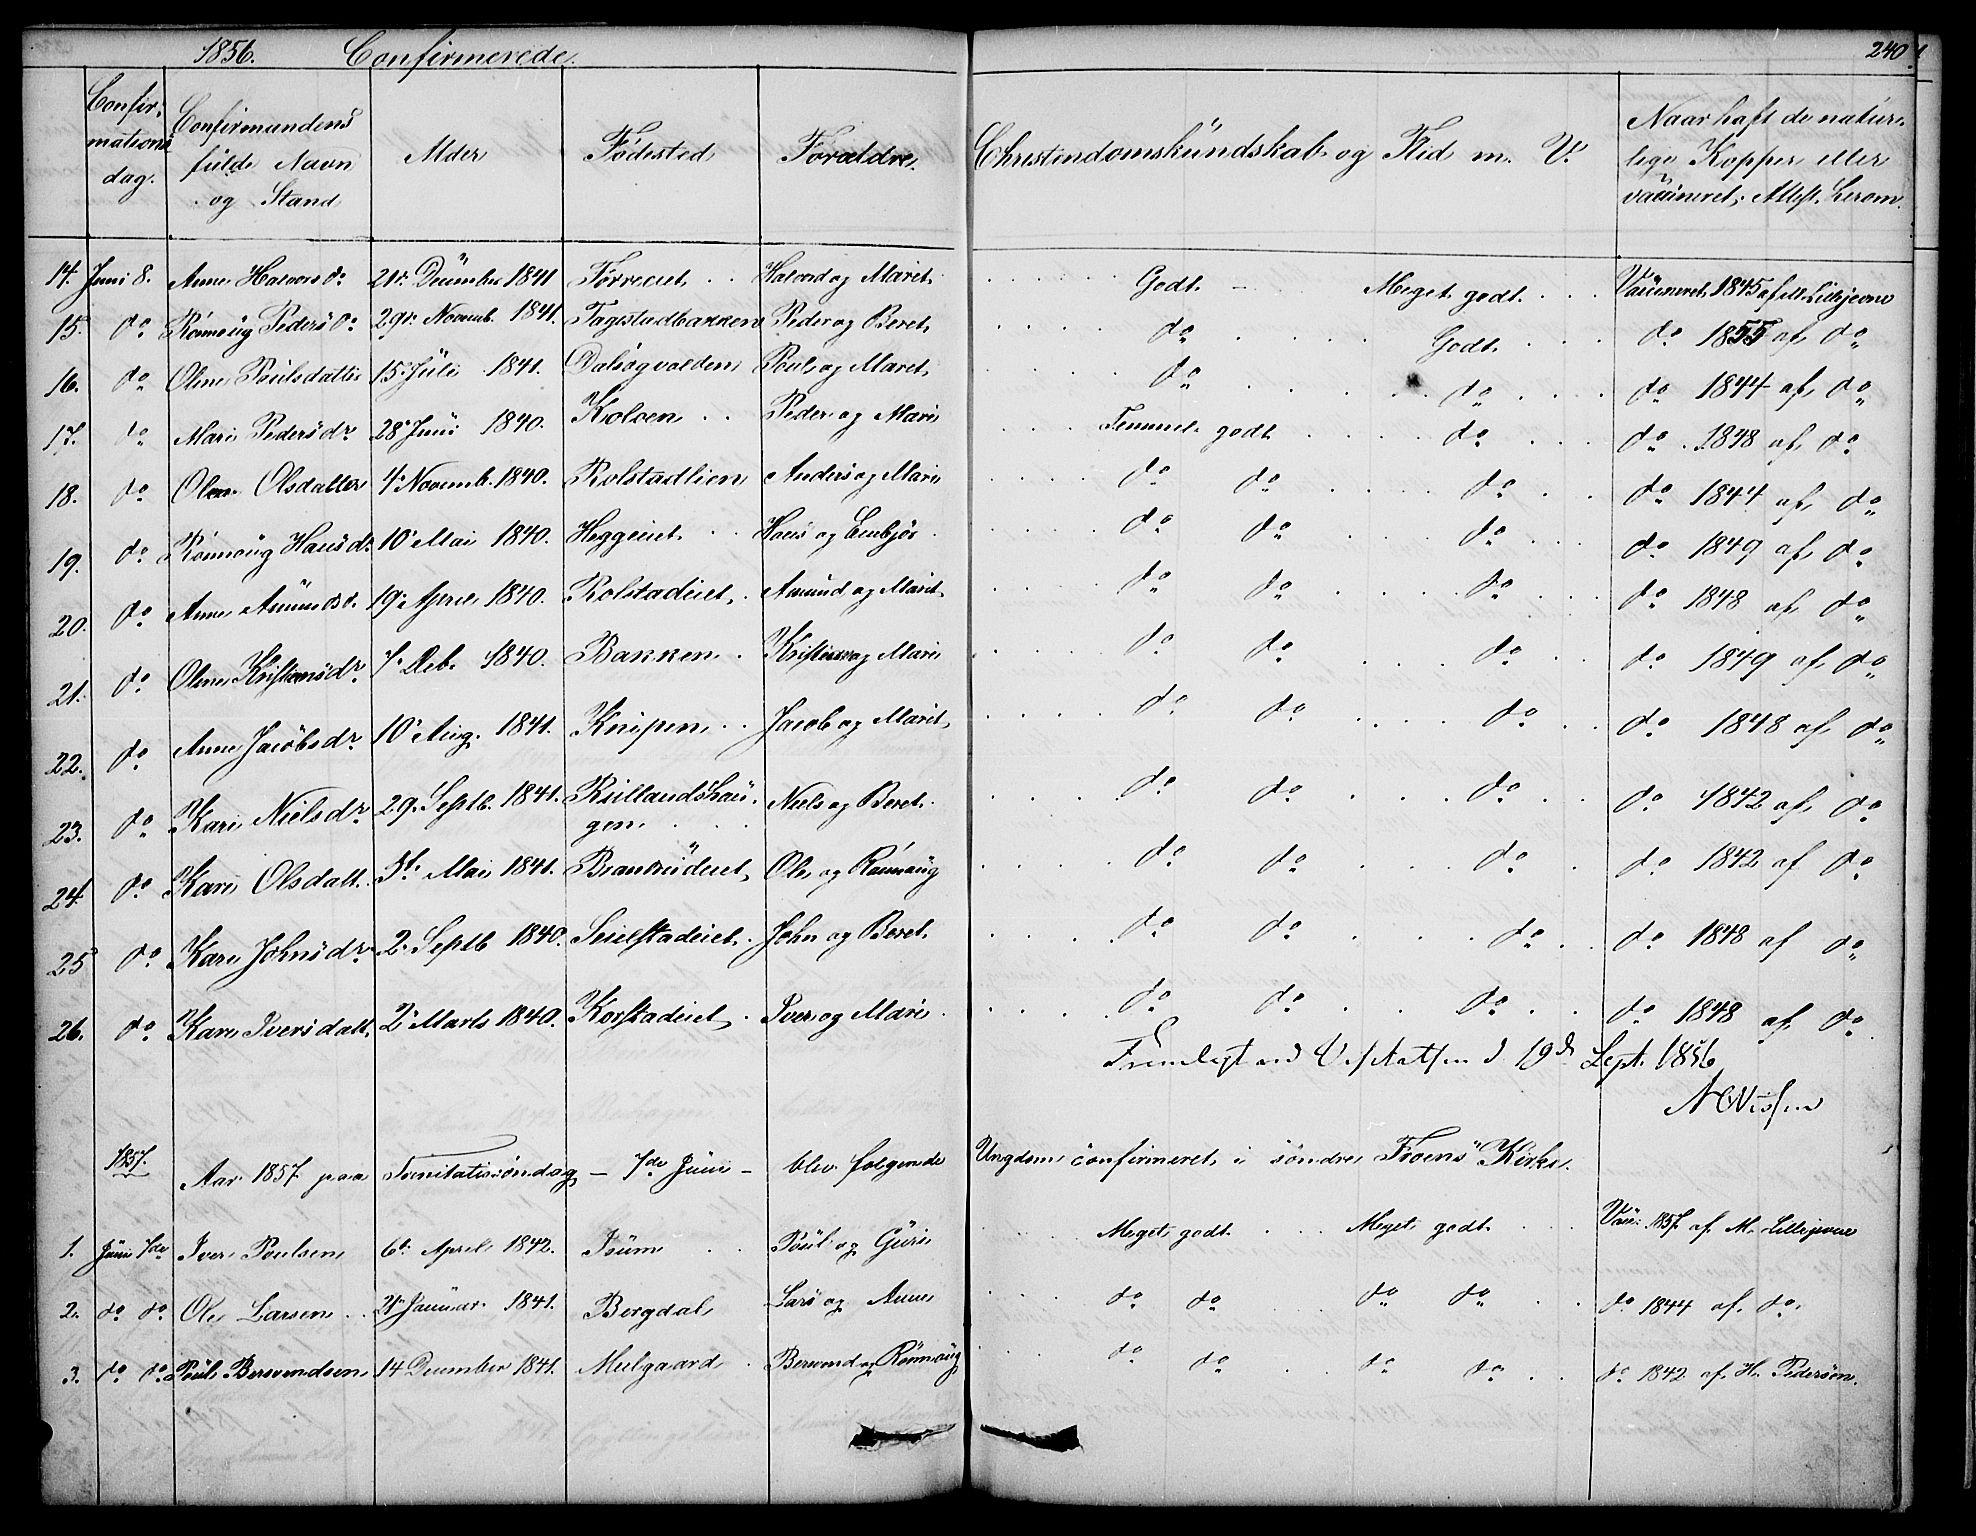 SAH, Sør-Fron prestekontor, H/Ha/Hab/L0001: Klokkerbok nr. 1, 1844-1863, s. 240